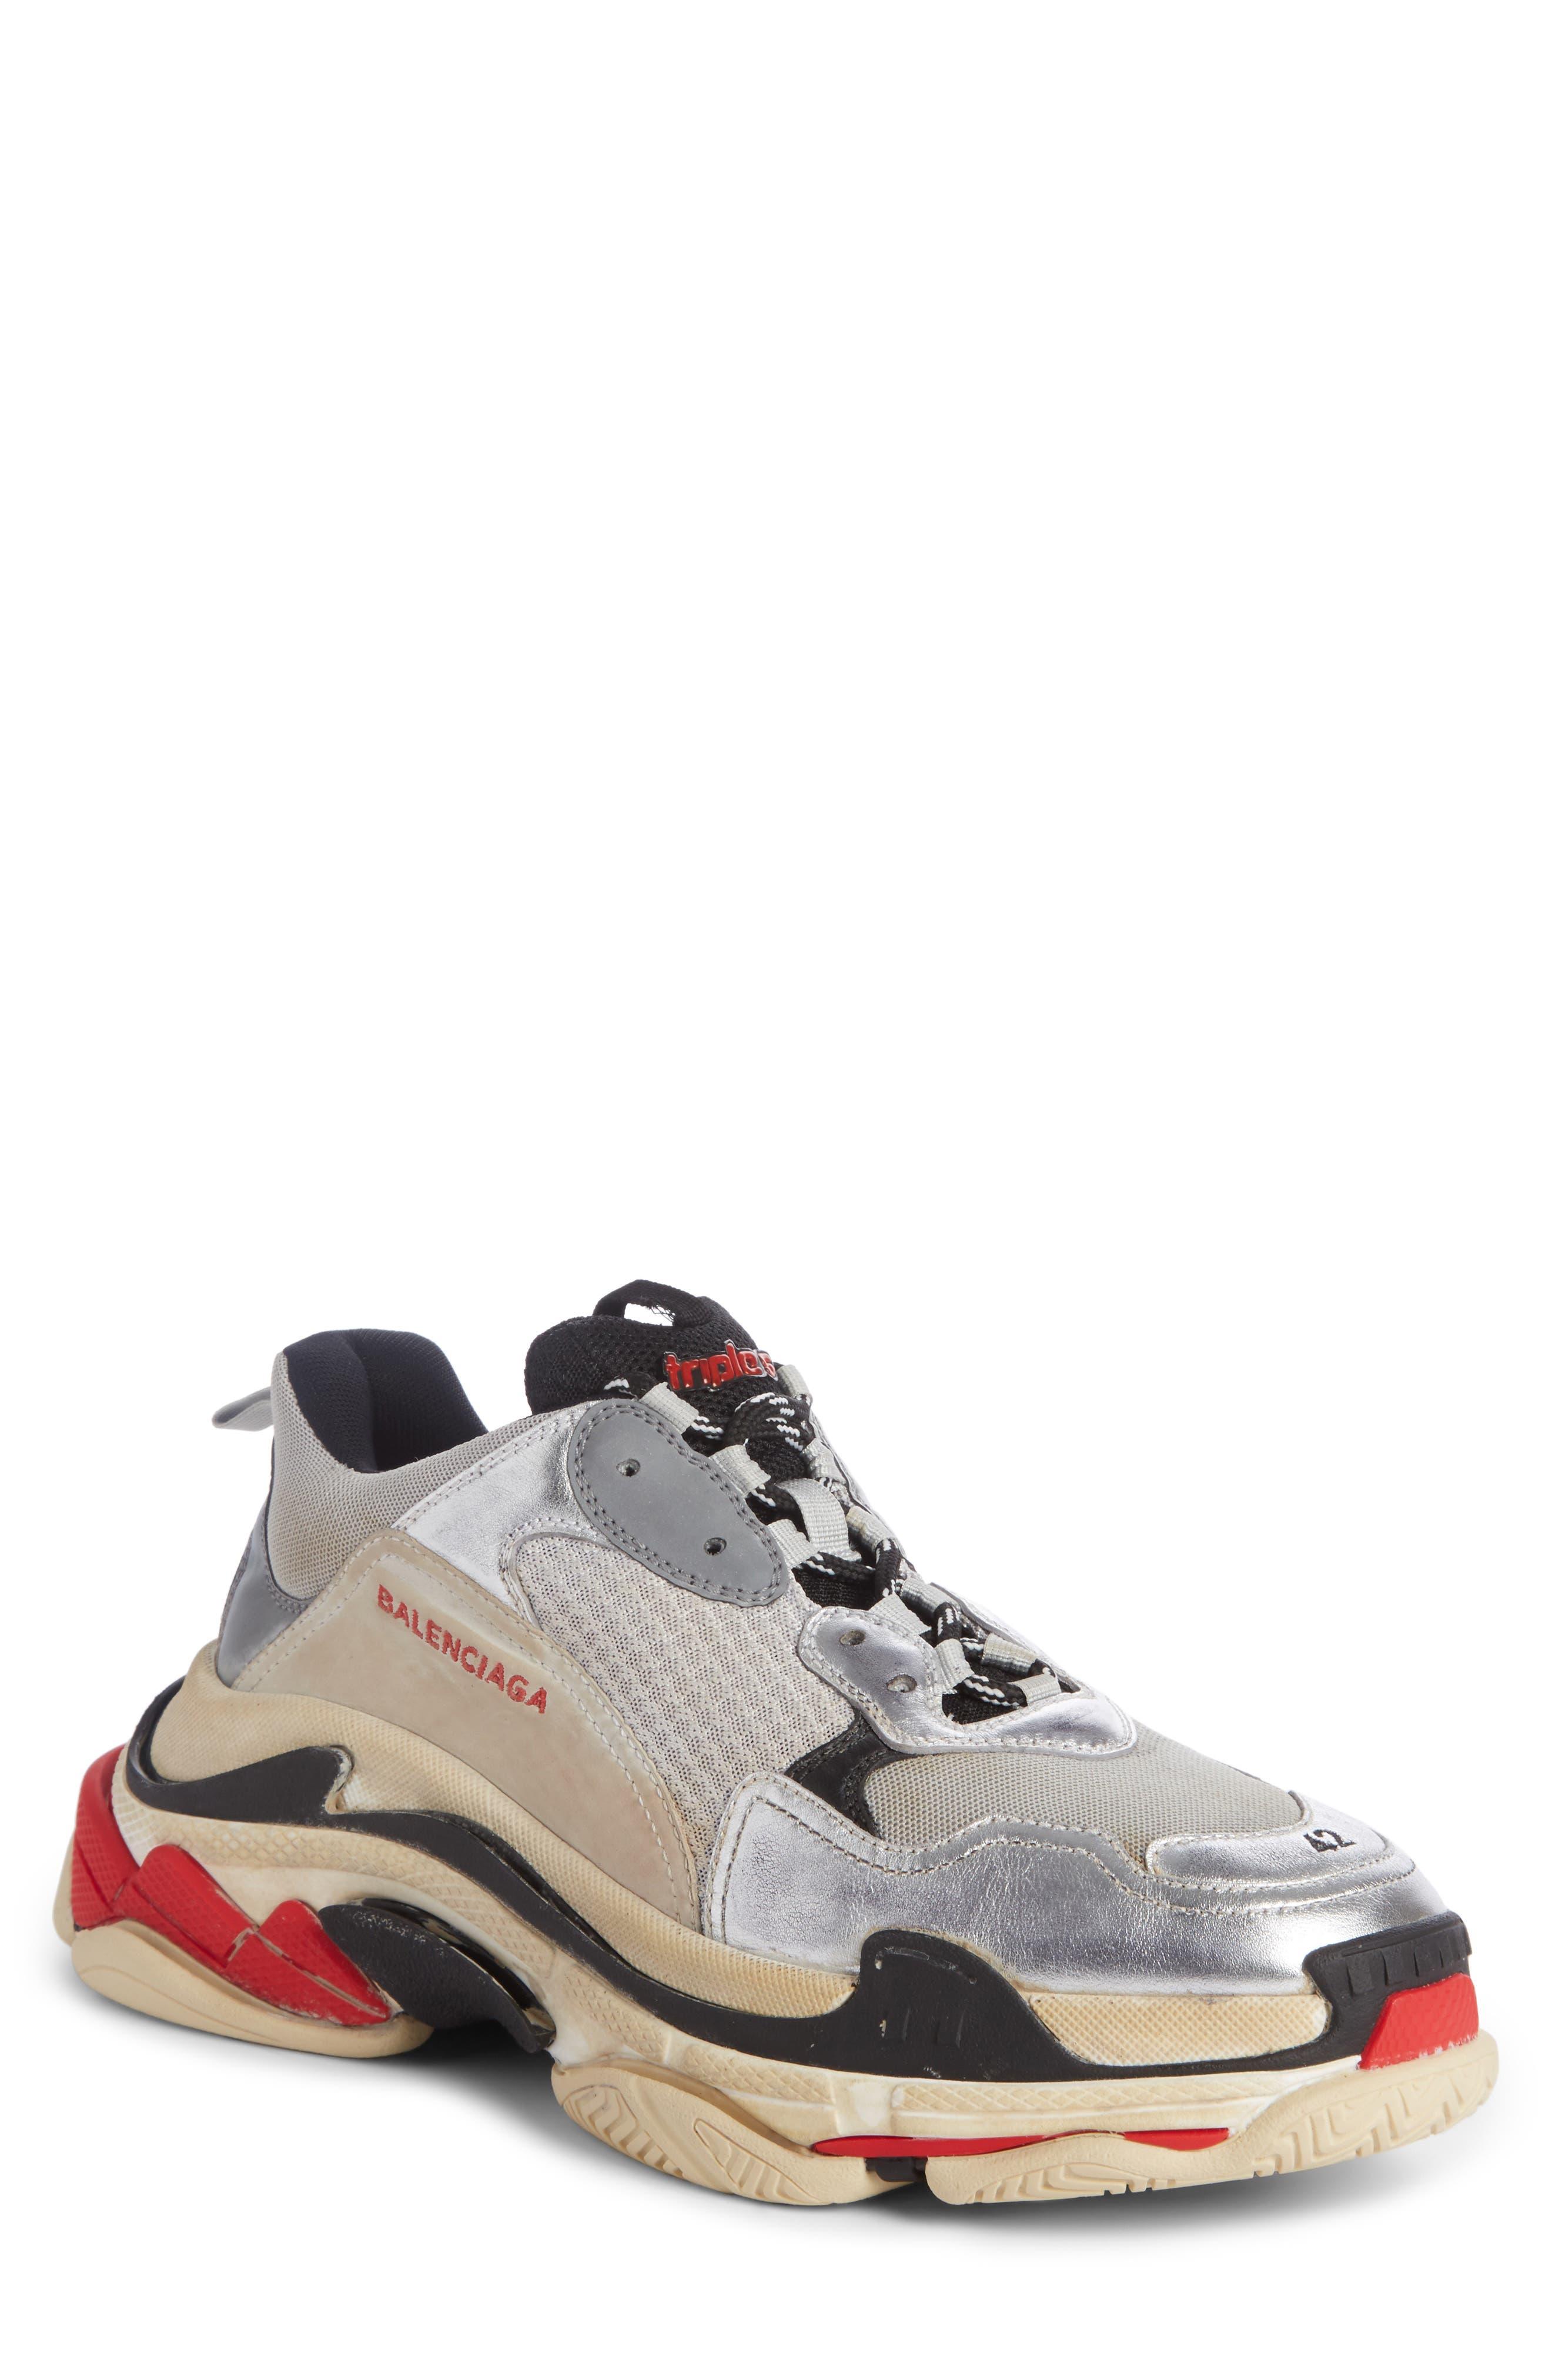 Alternate Image 1 Selected - Balenciaga Triple S Retro Sneaker (Men)